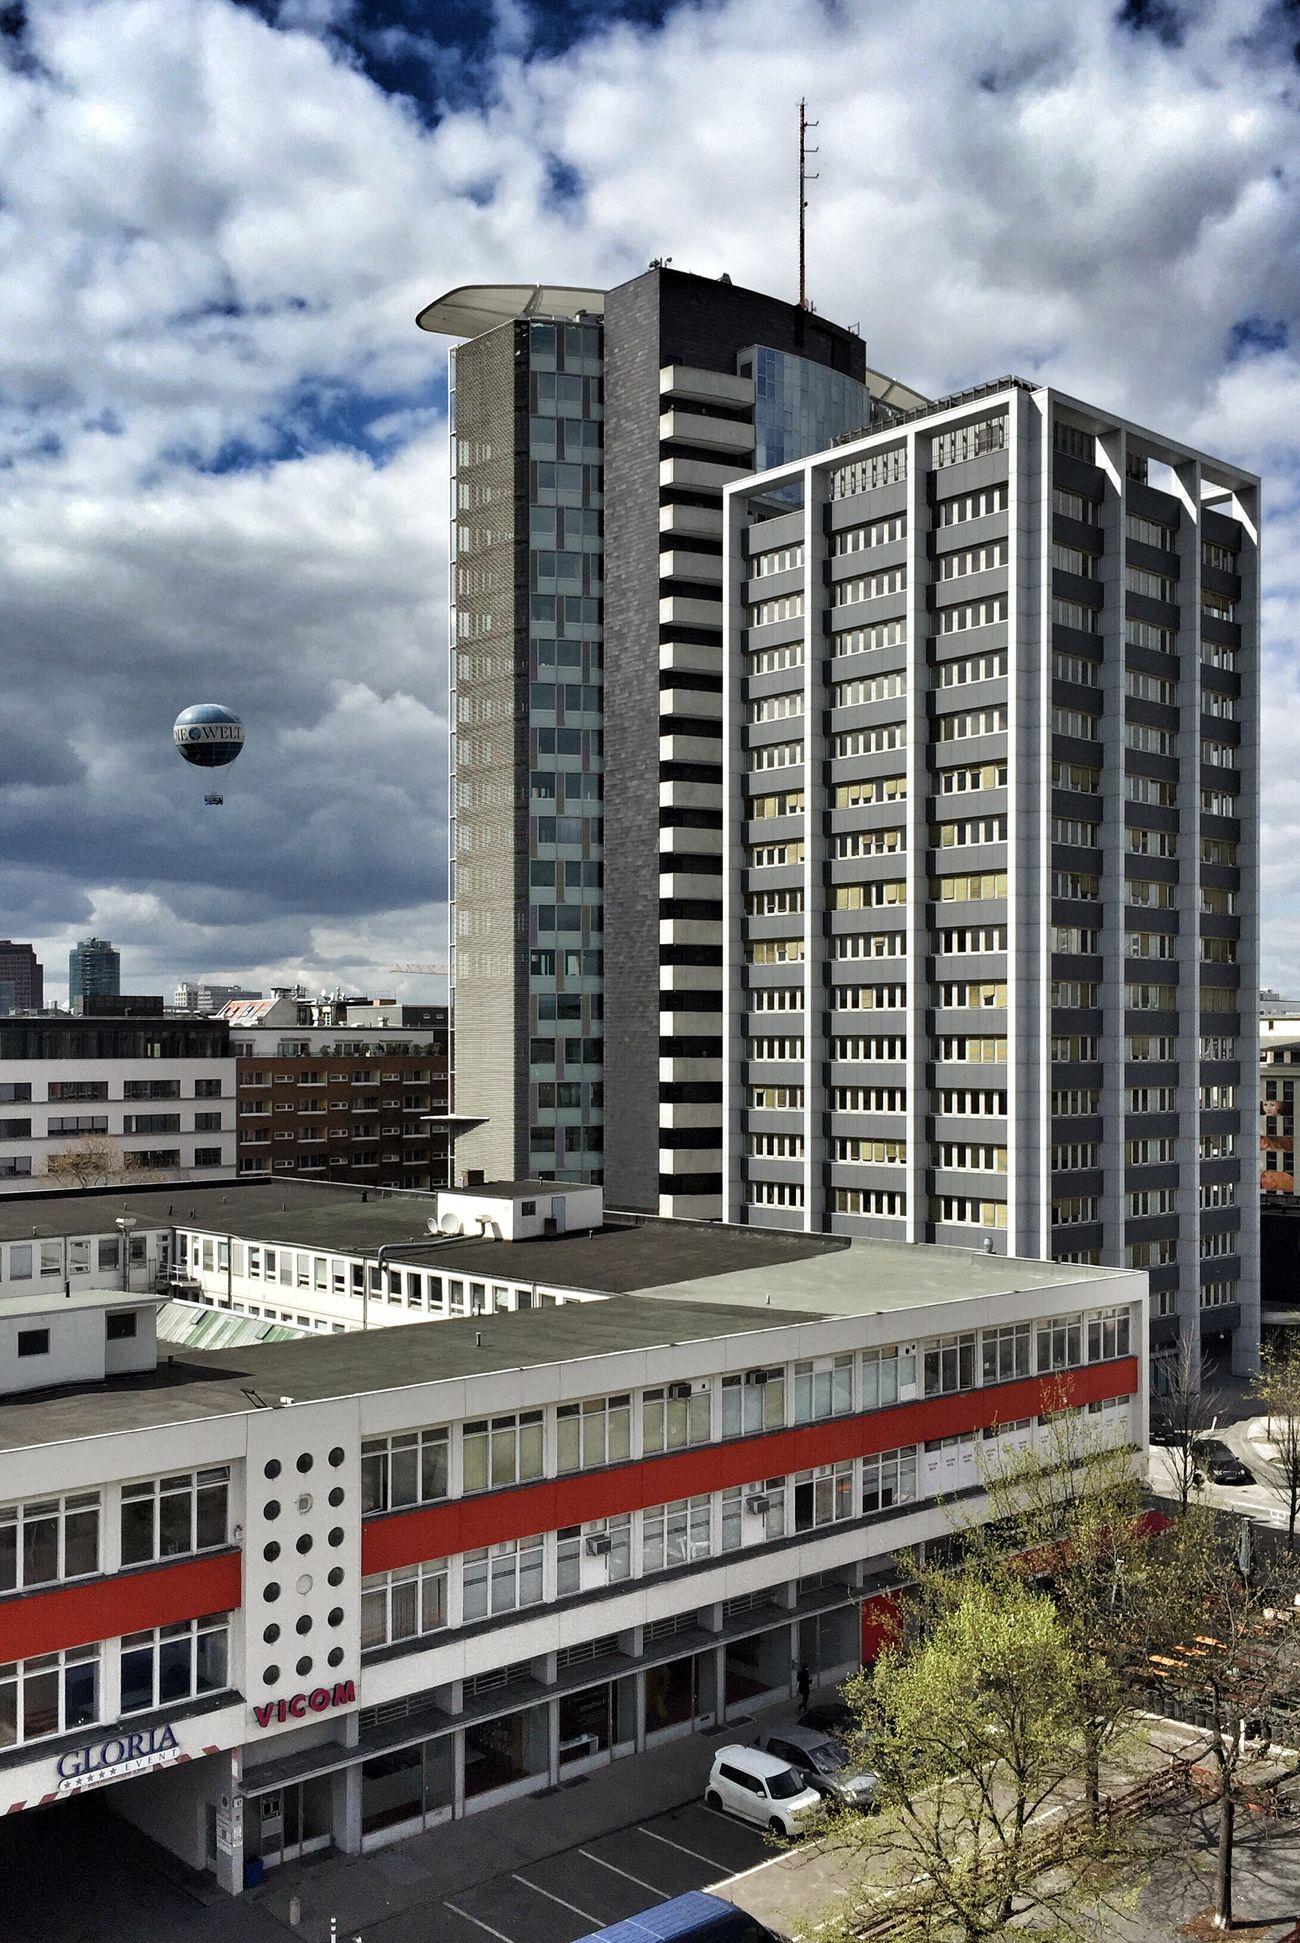 My Fuckin Berlin Kreuzberg Südliche Friedrichstadt GSW Haus Rooftops Skyporn Clouds And Sky Der Himmel über Berlin